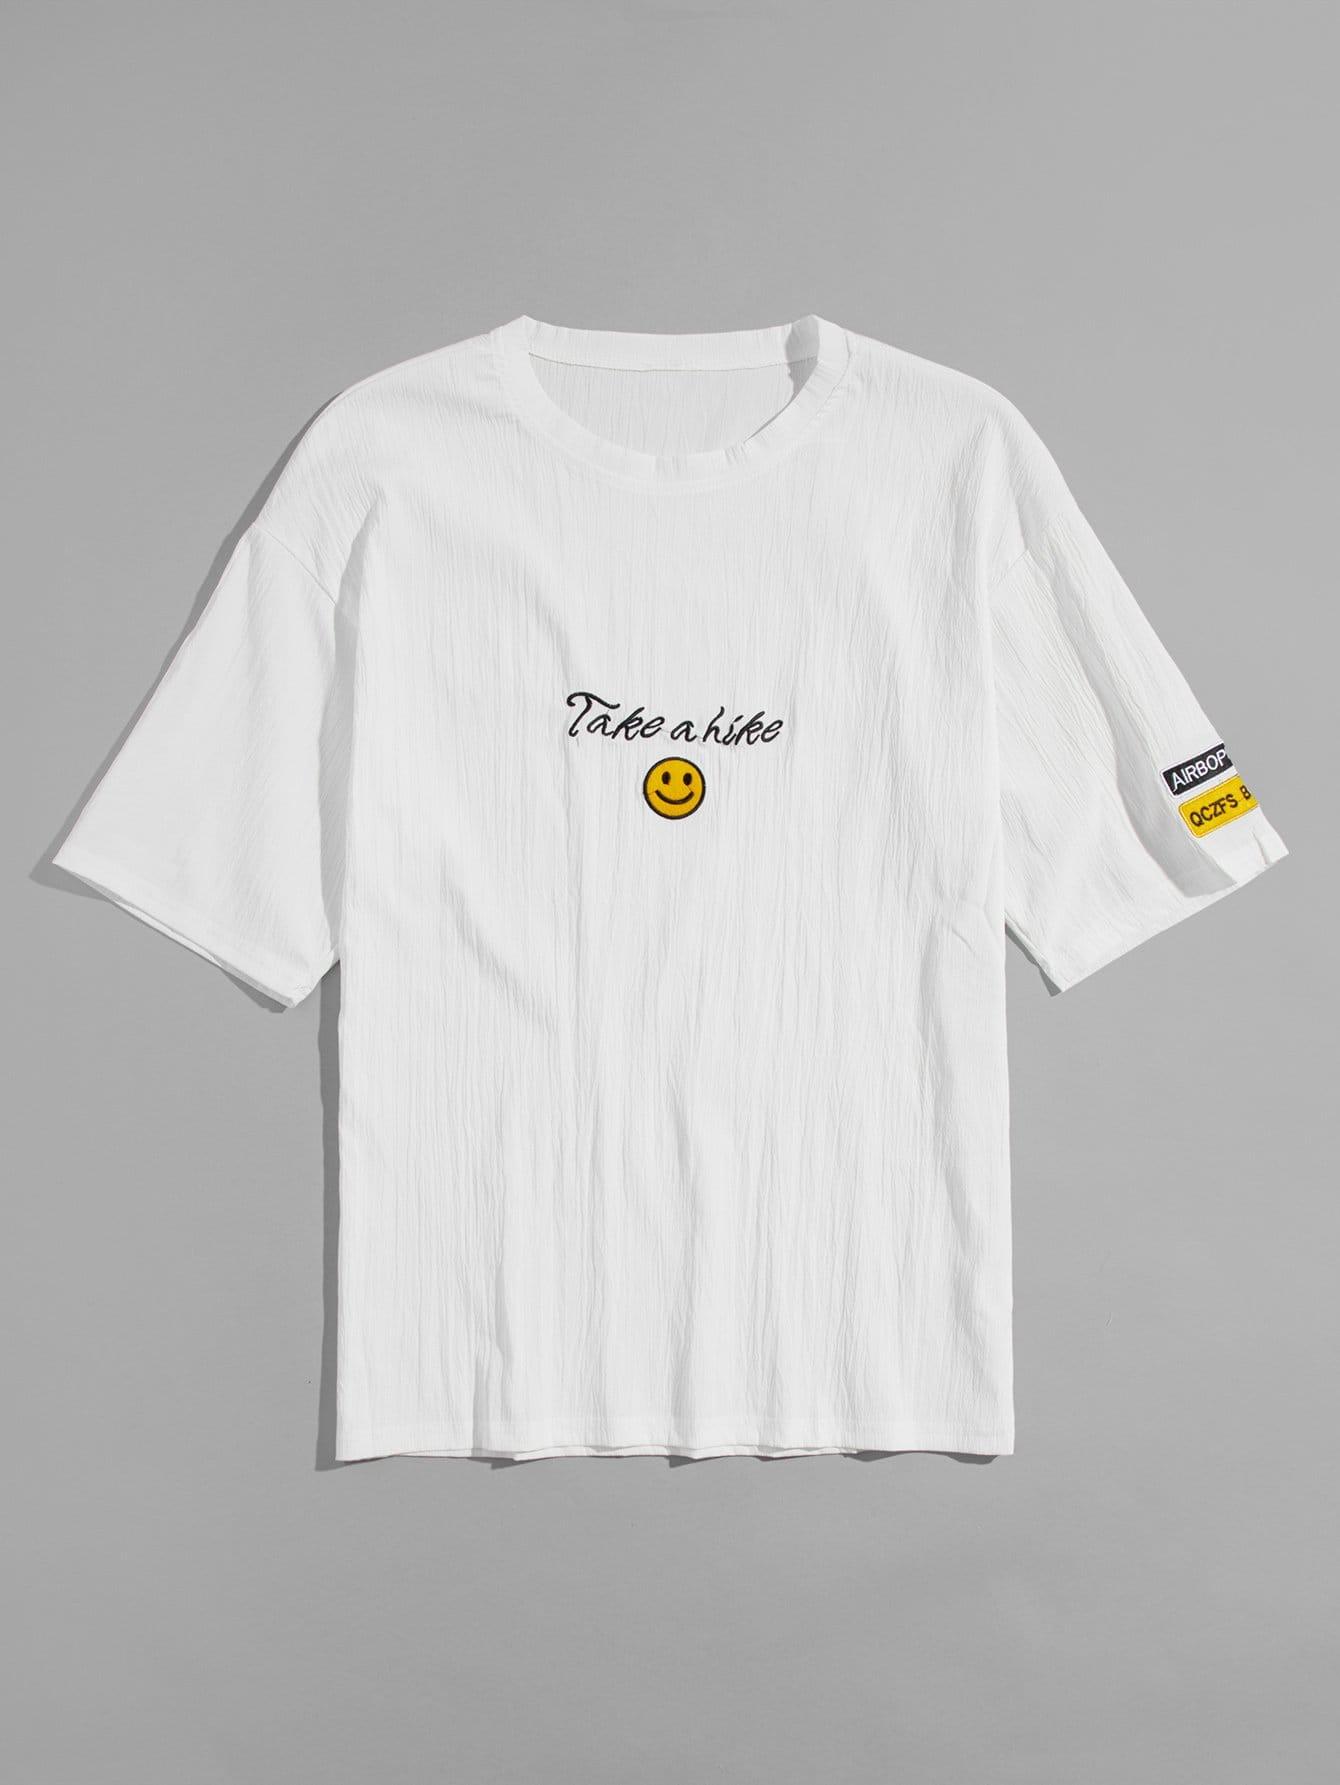 Купить Мужская футболка Smile Embroidery, null, SheIn